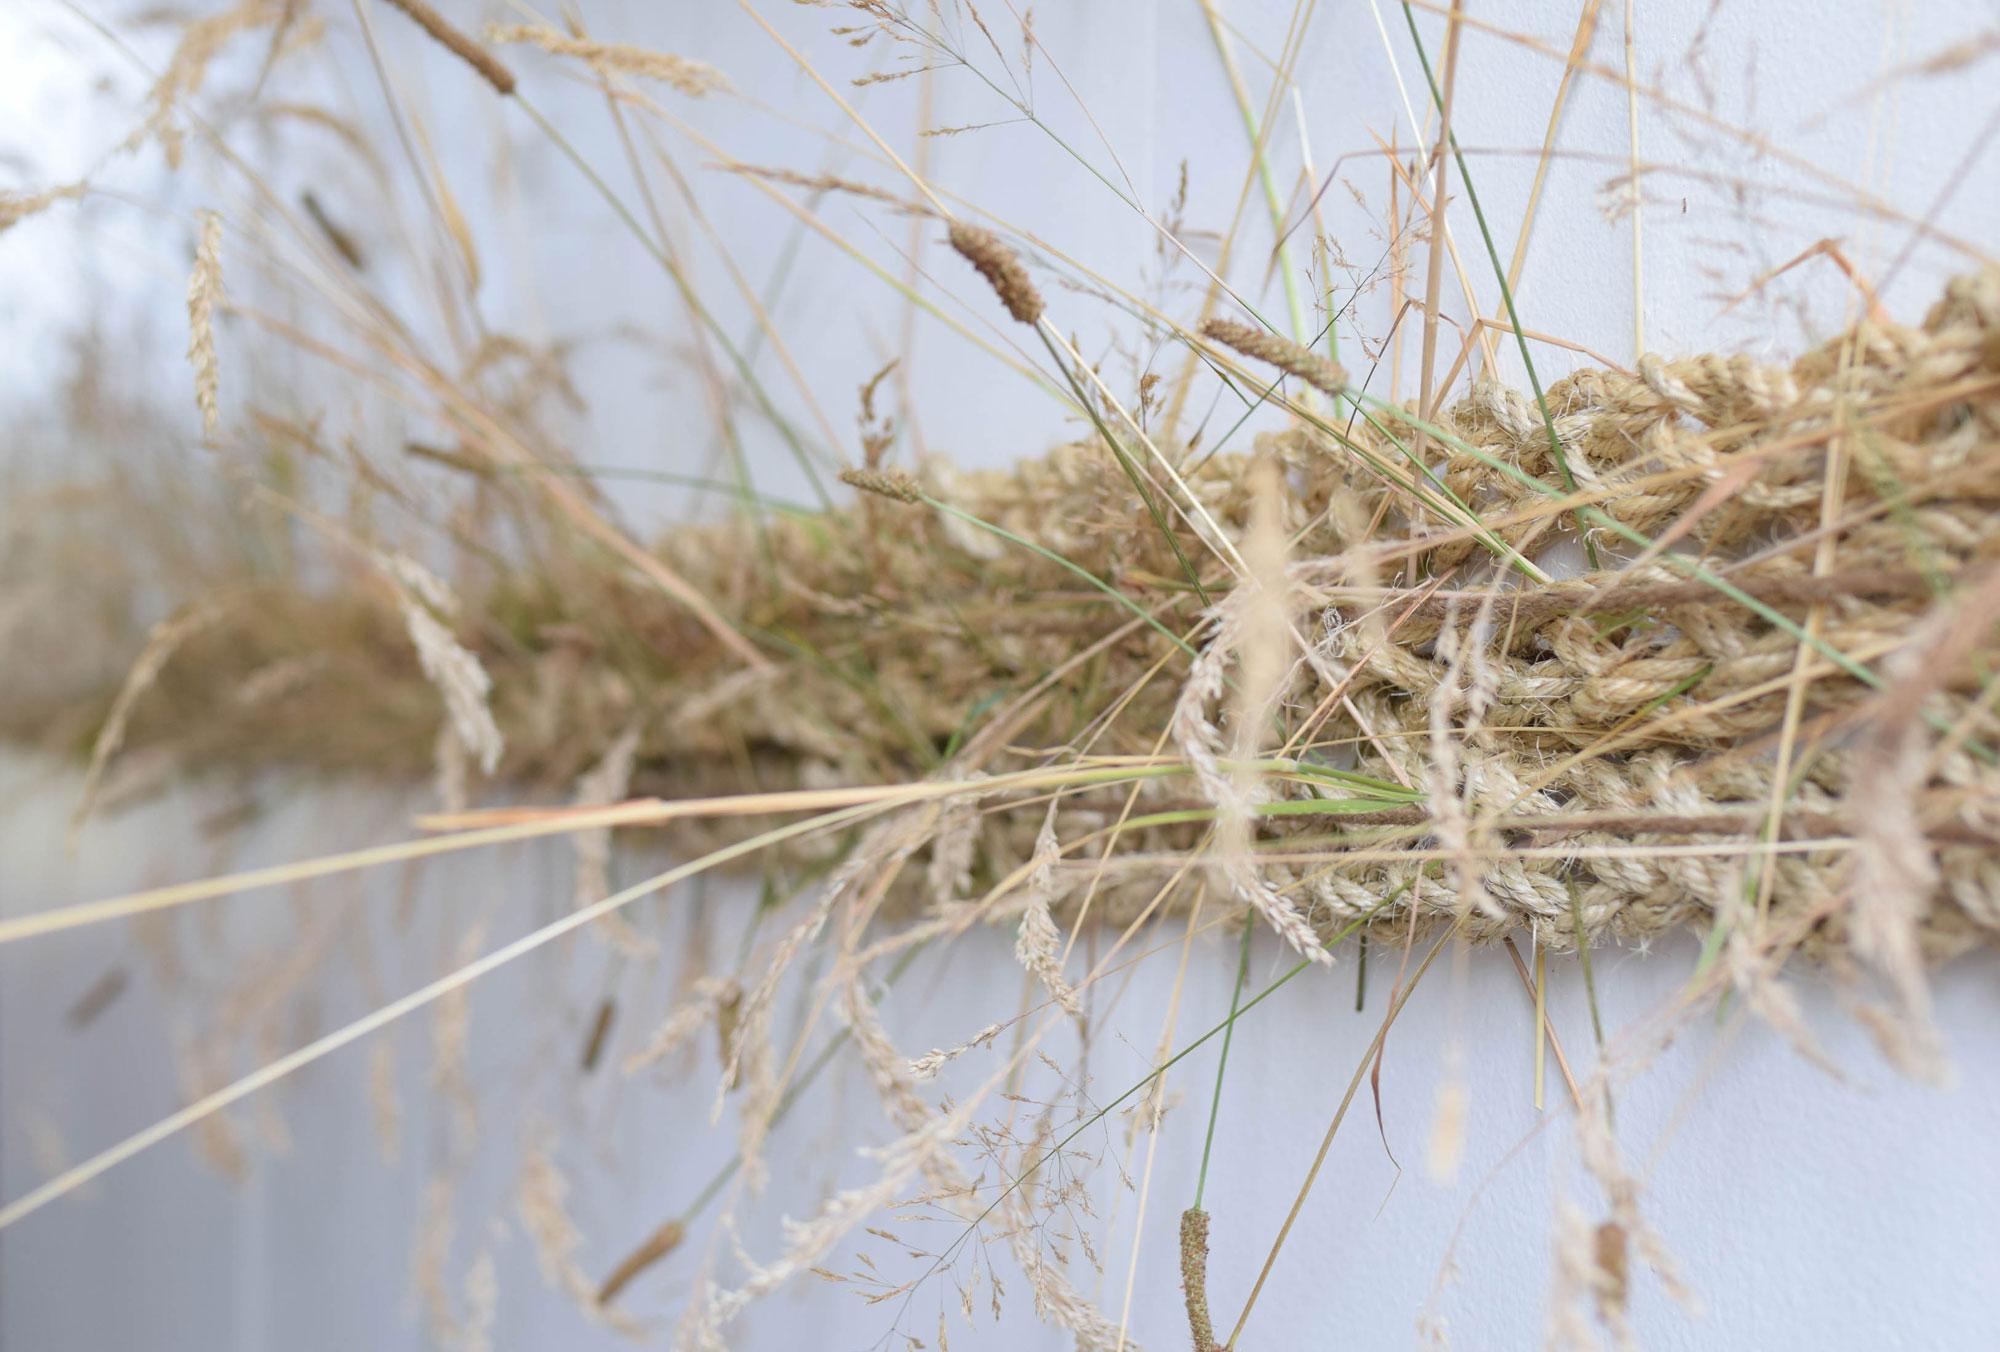 BBJ-Photoshoot--Curious-Lola---Grass-(5)